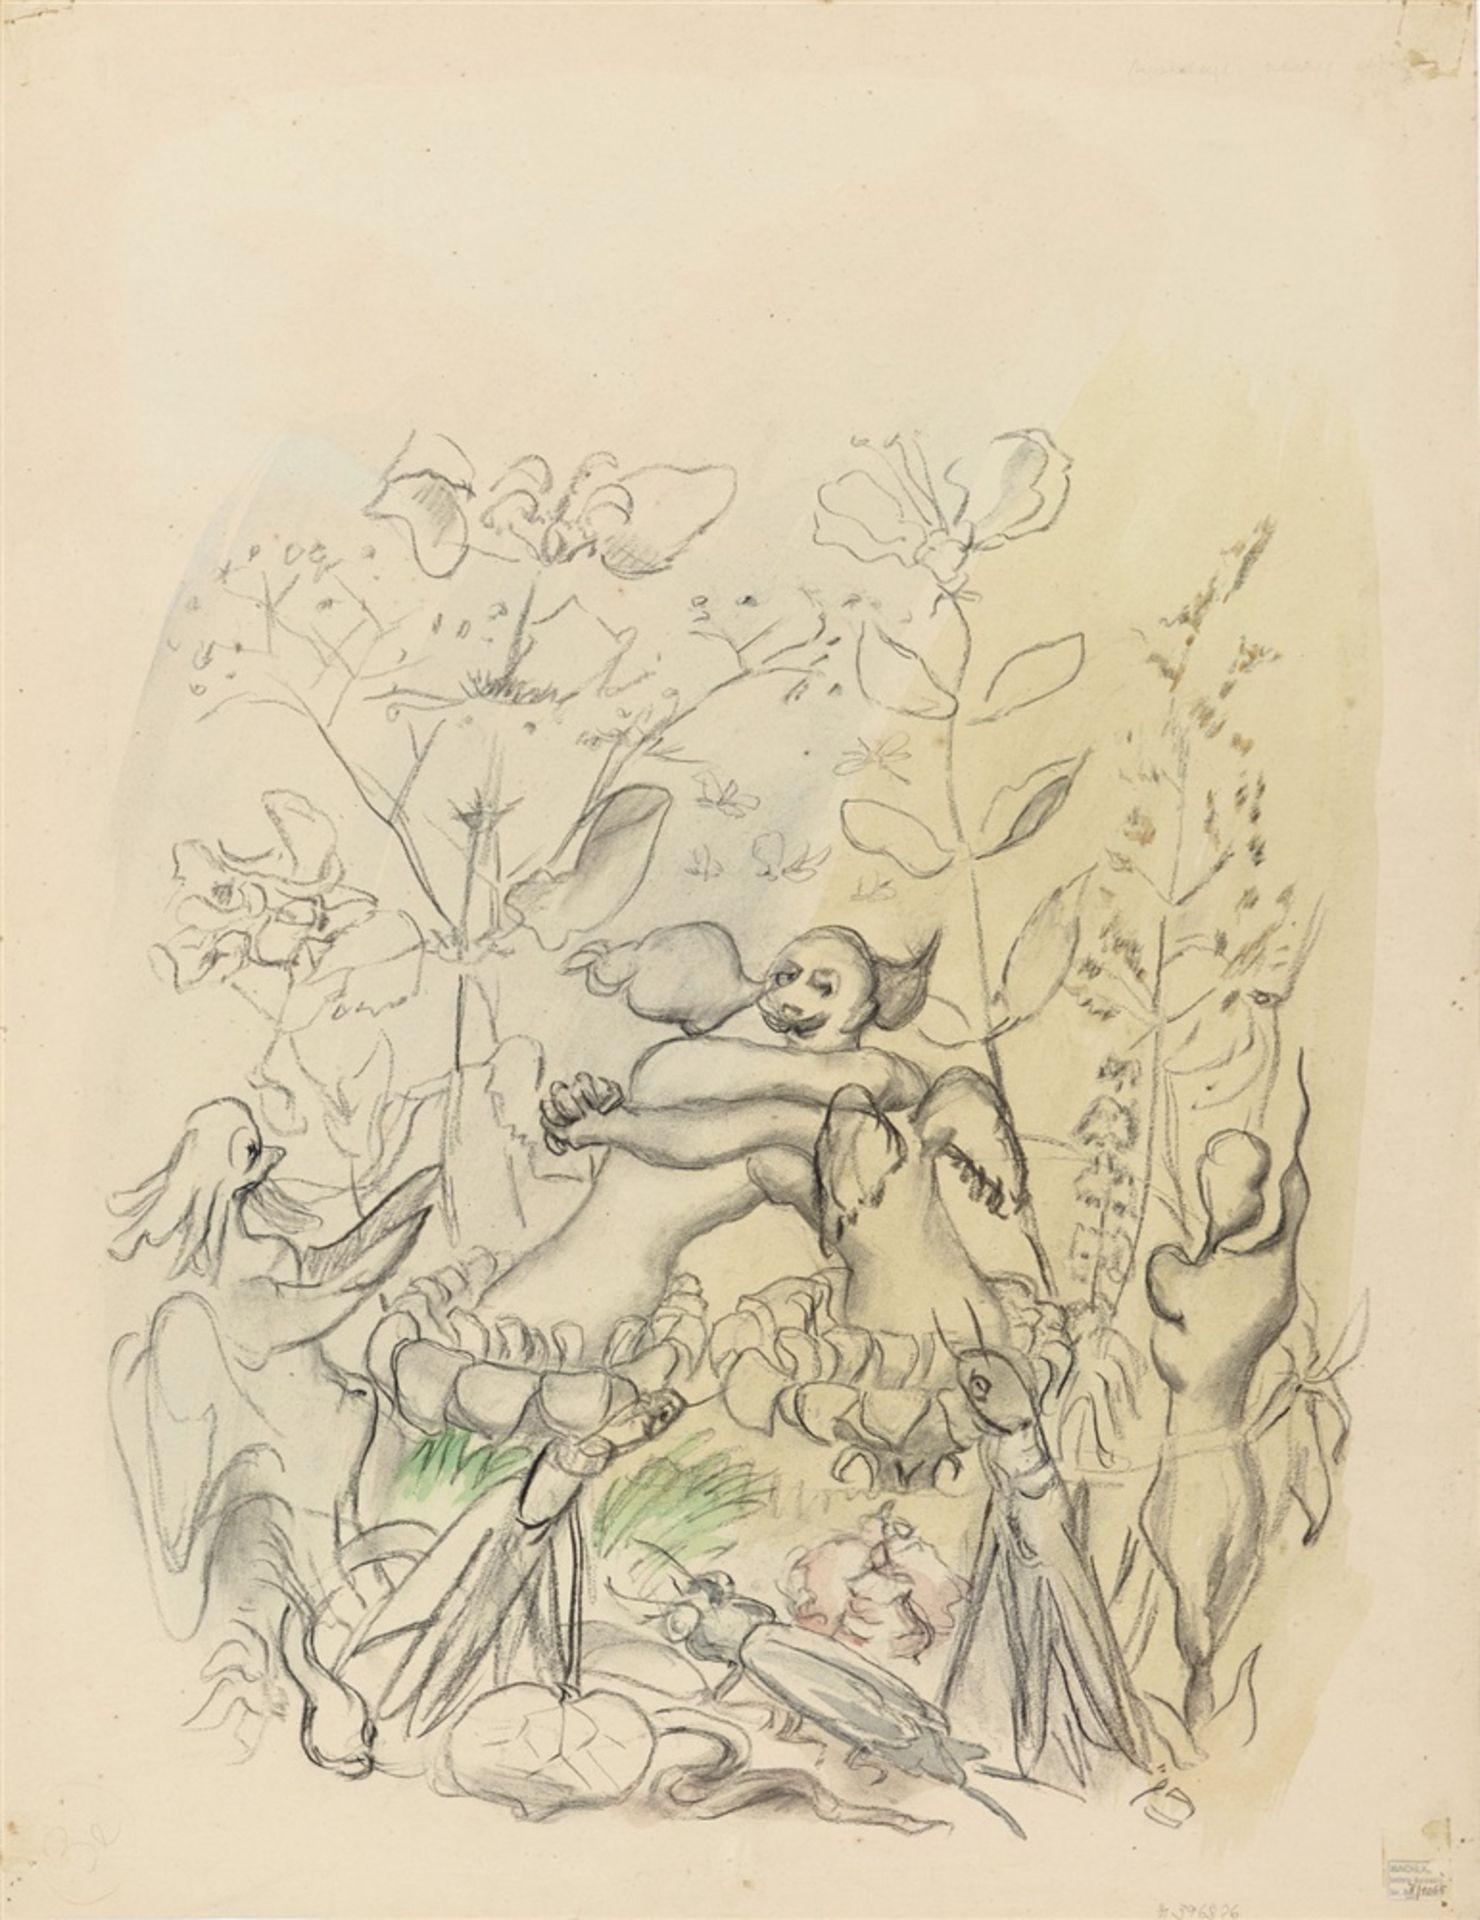 Ludwig MeidnerApokalyptische Komposition. Verso: Insektenszene - Bild 2 aus 2